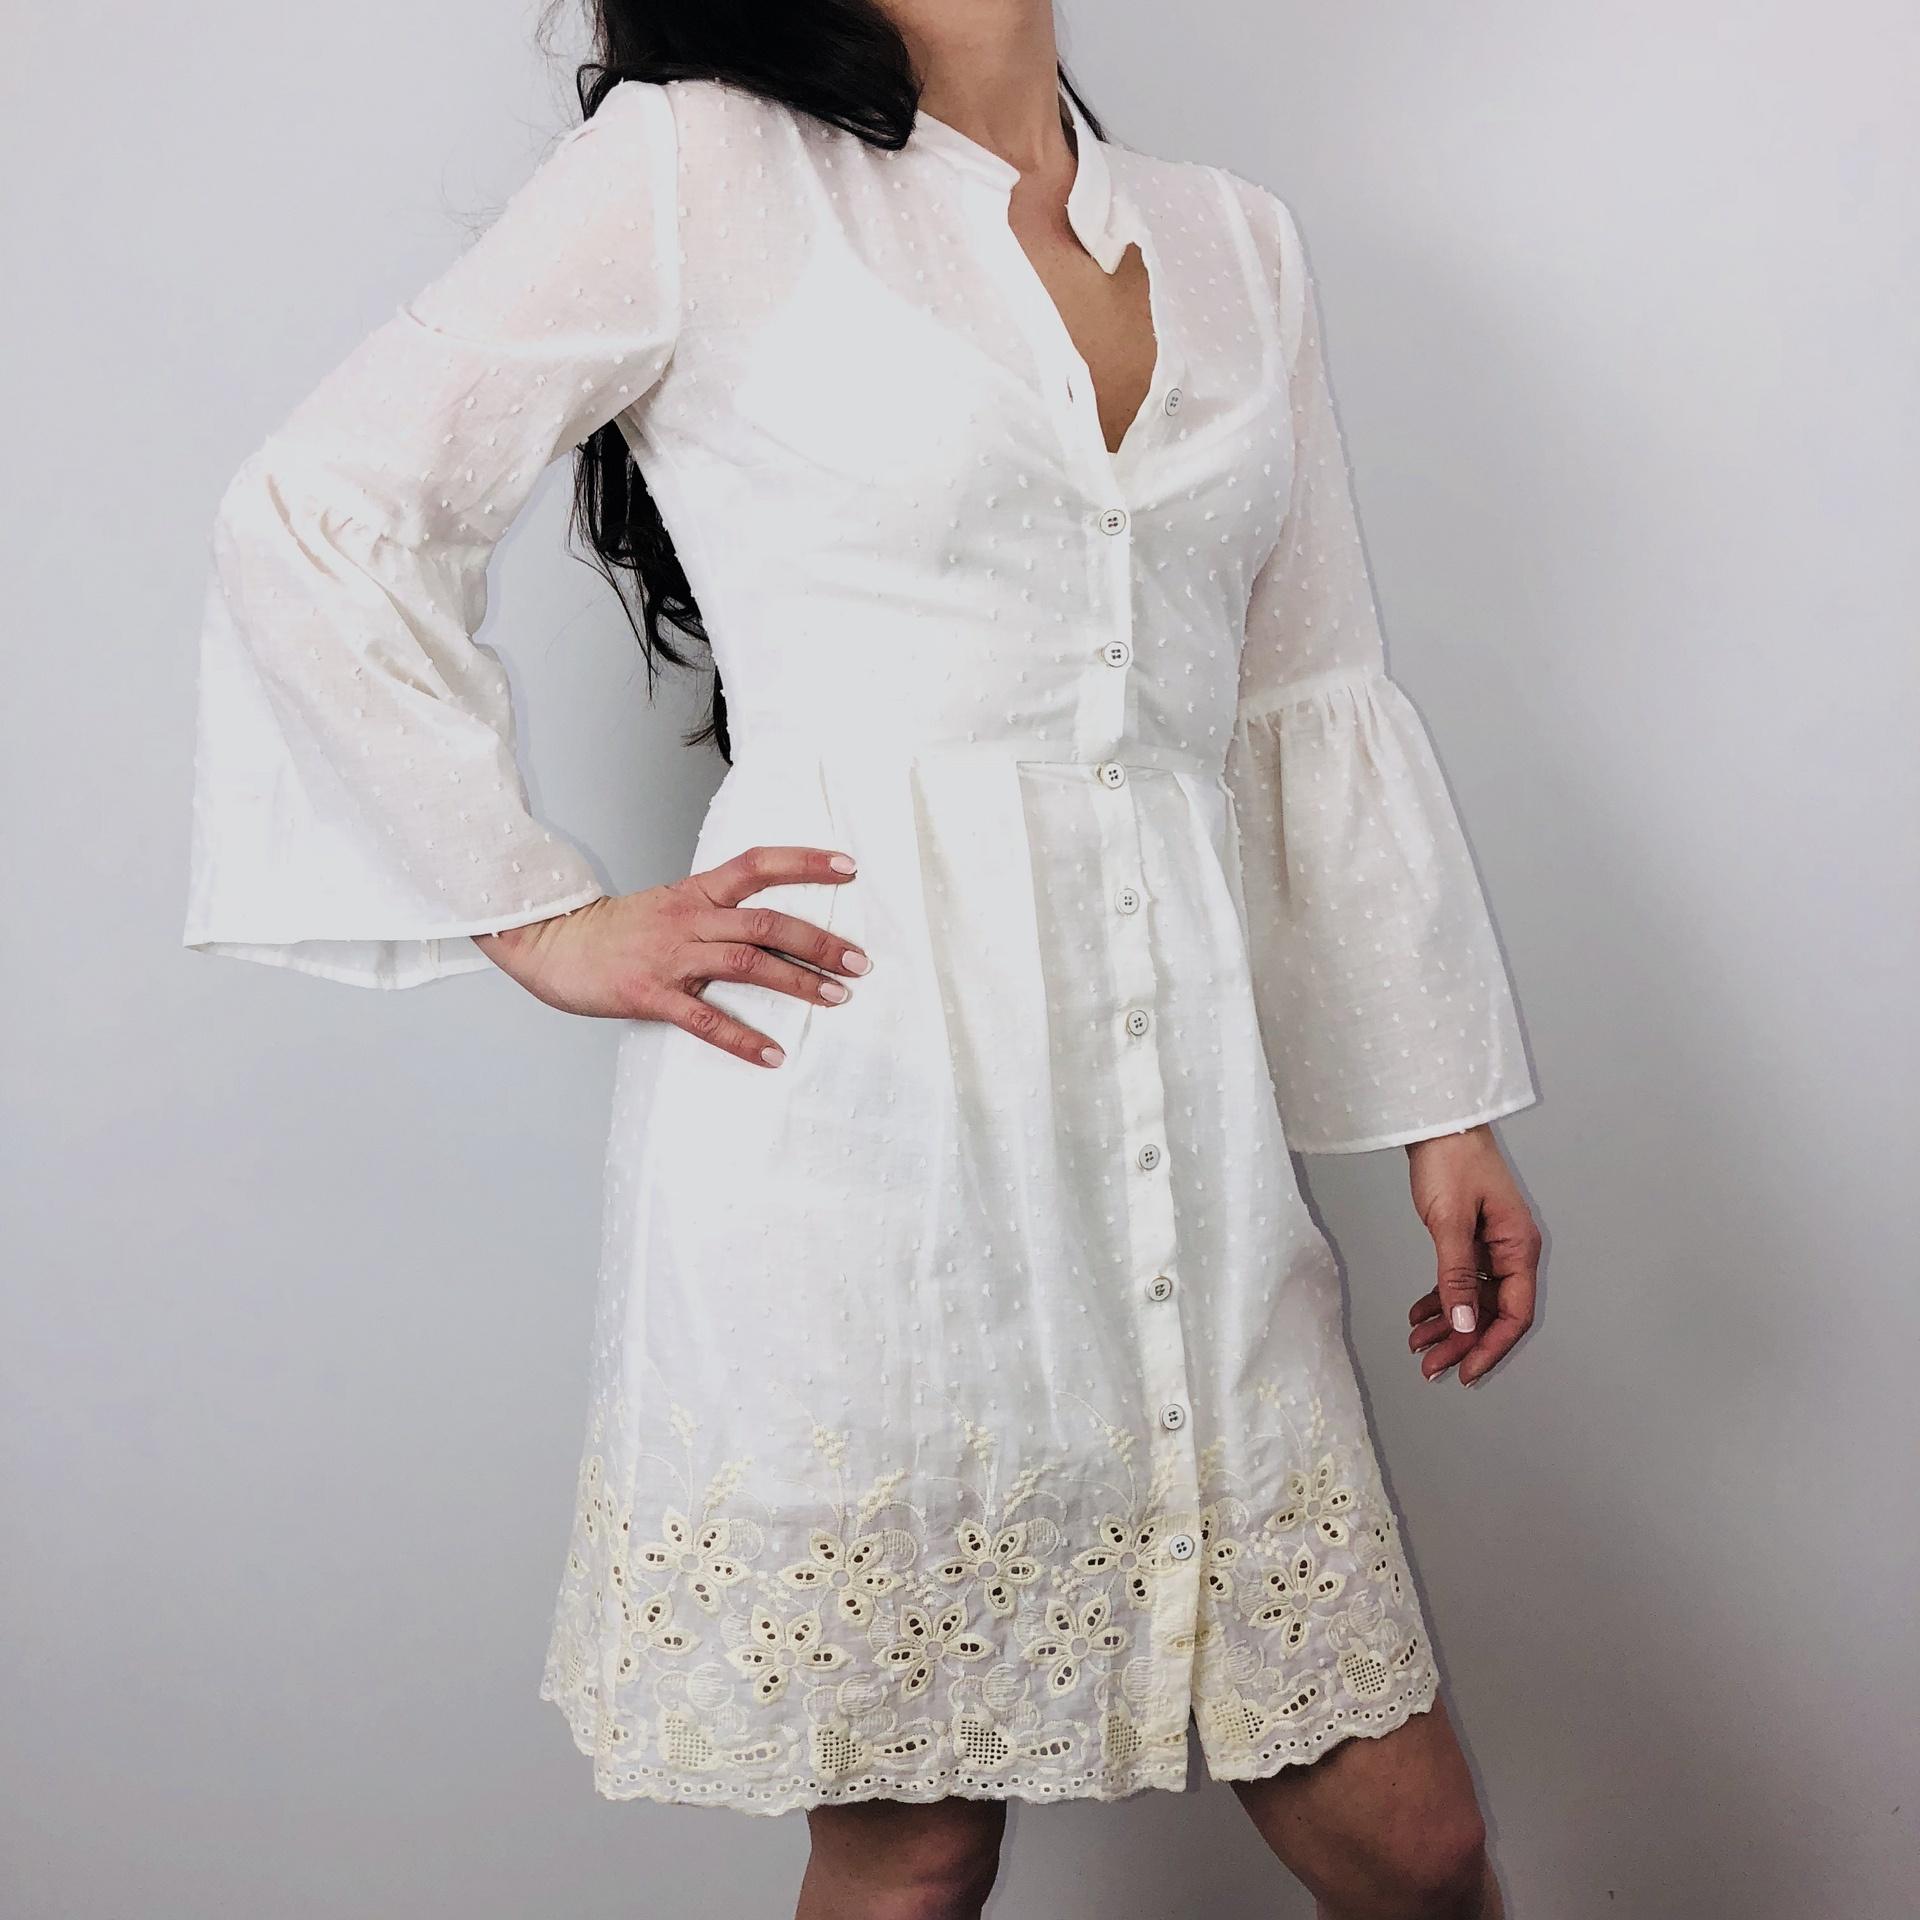 Access Short White Dress 3041